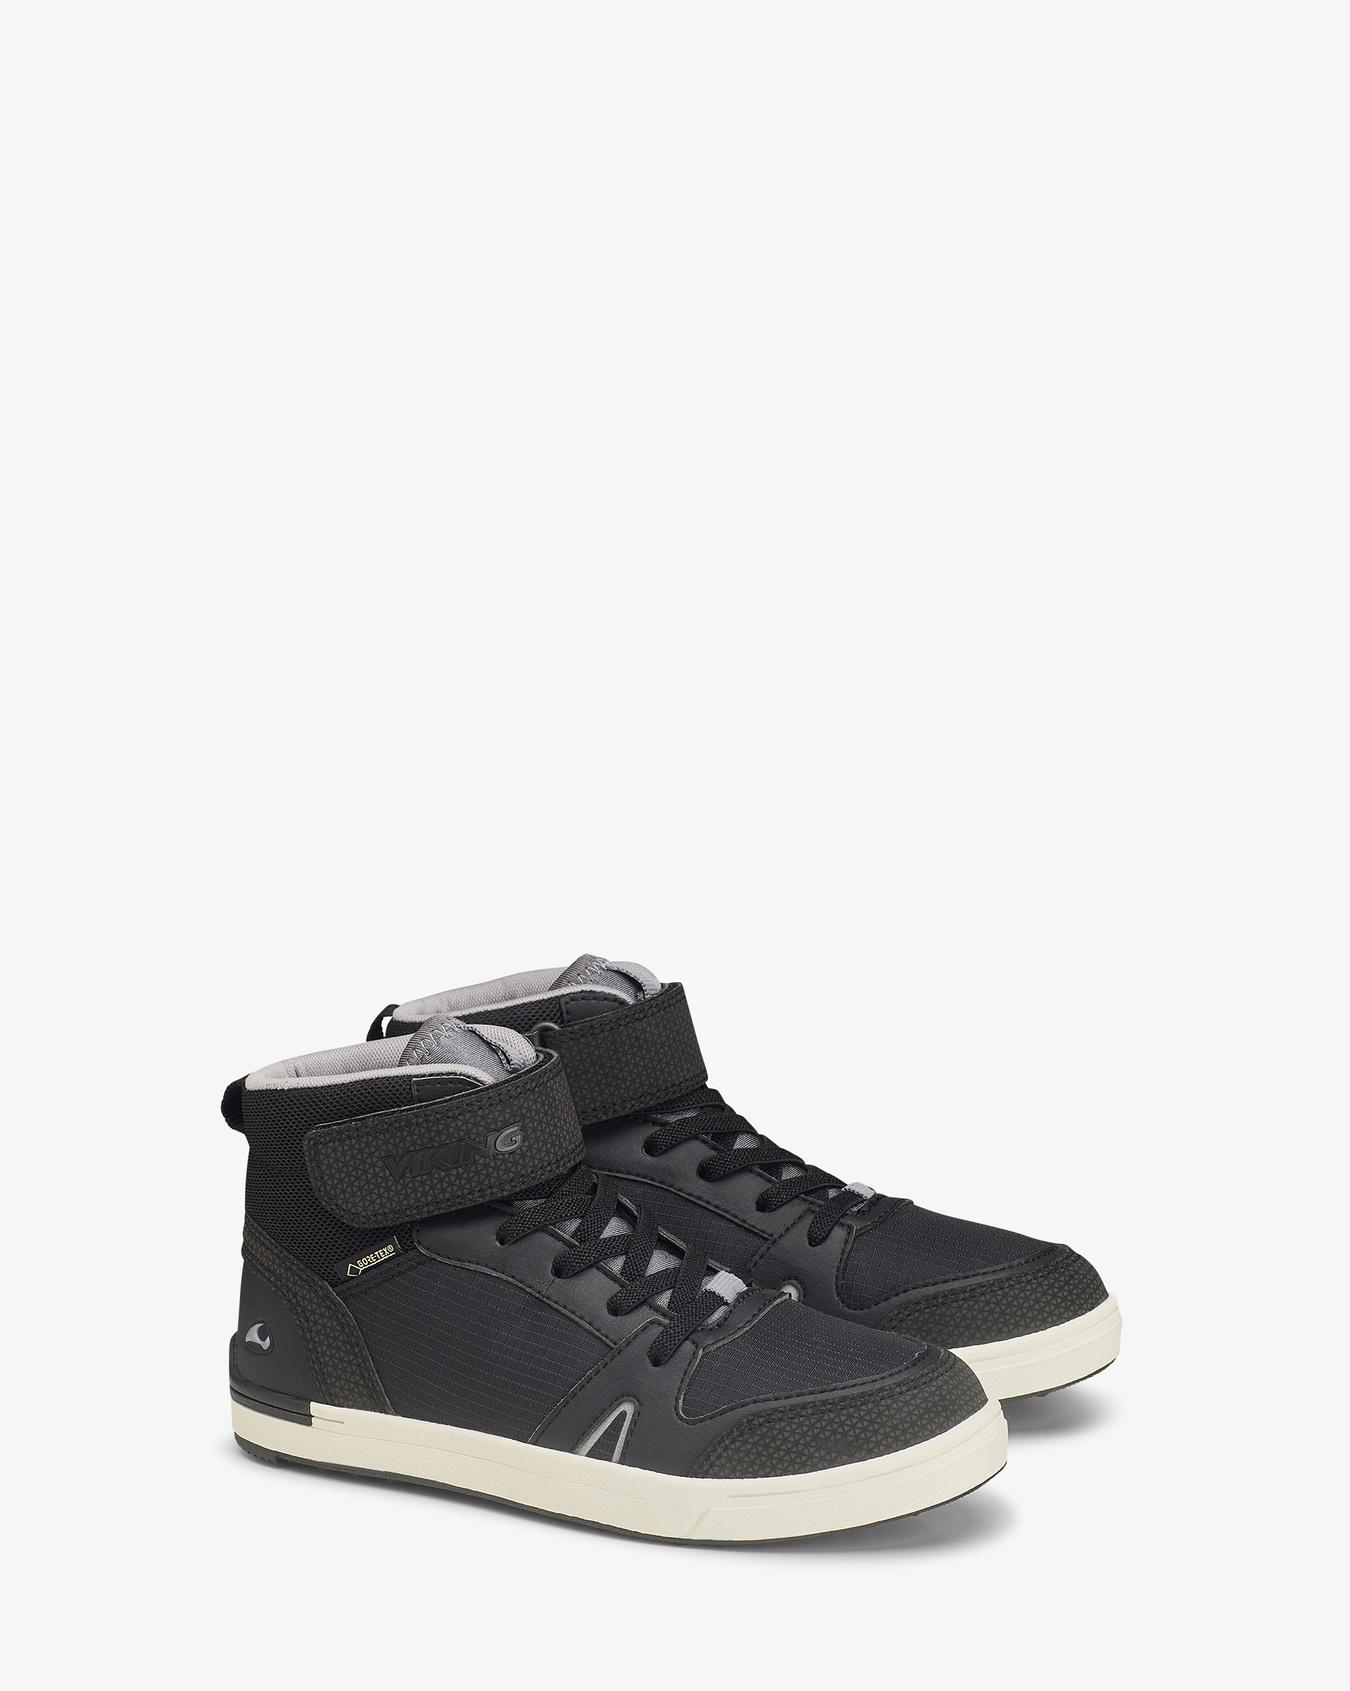 Markus Mid GTX Black Sneaker